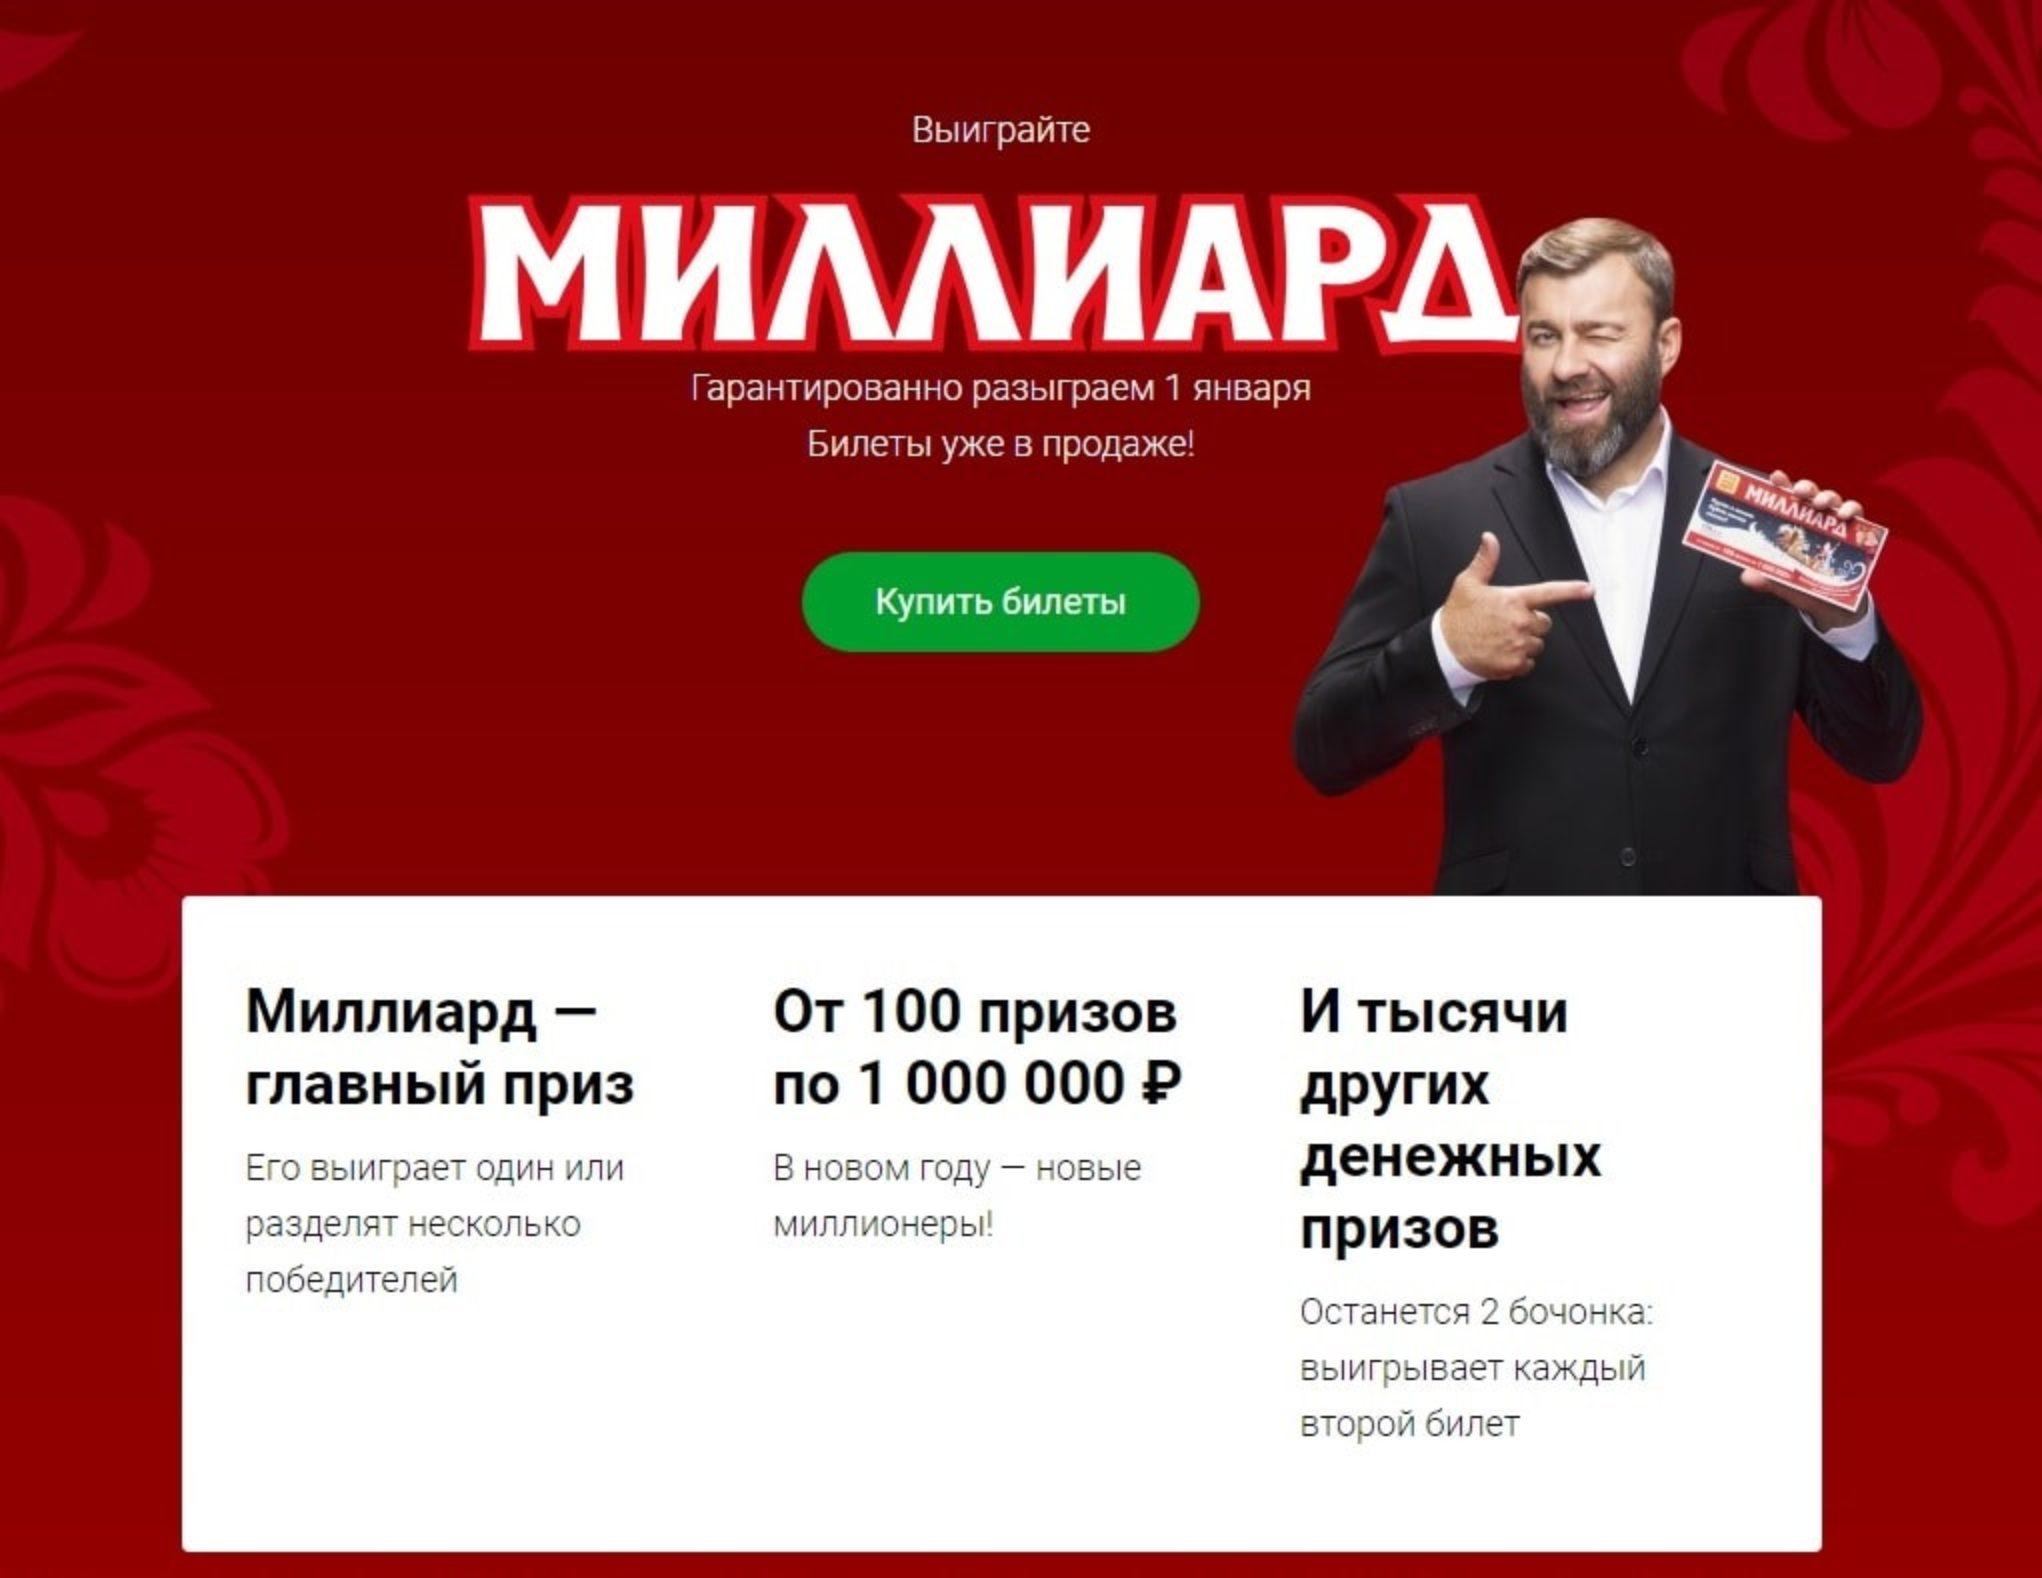 Русское лото миллиард 2020 года. новогодний тираж лотереи